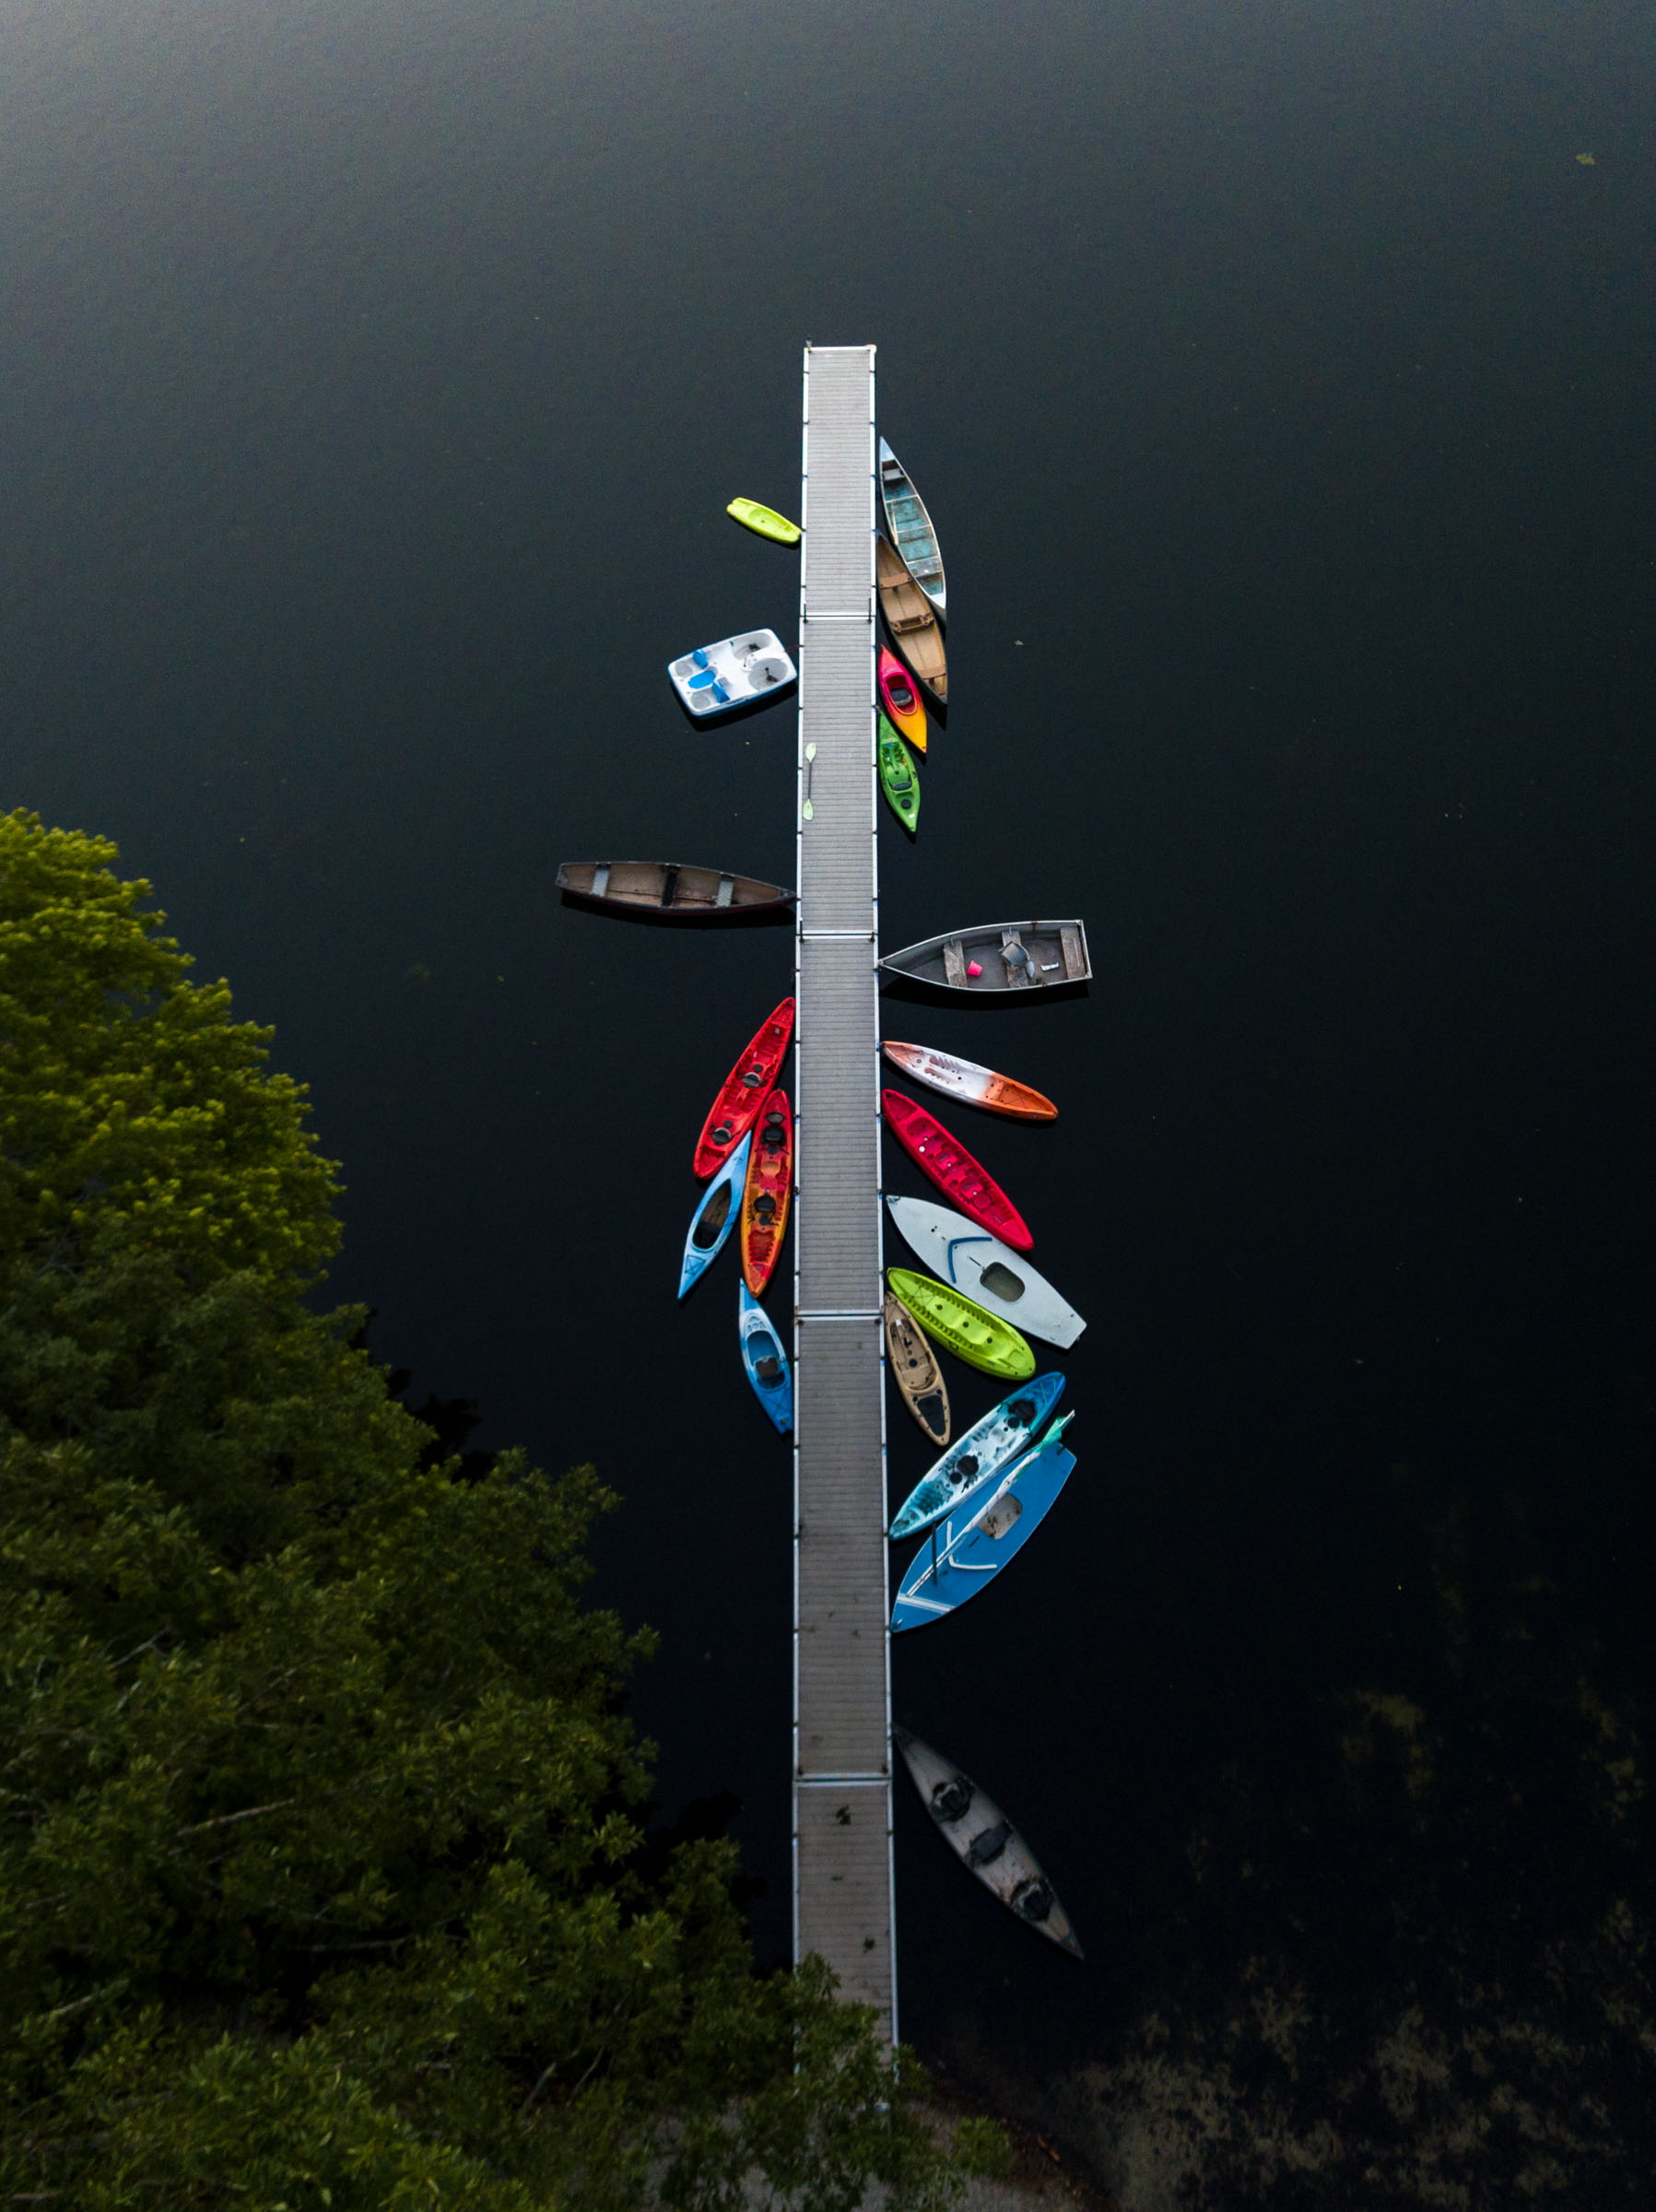 LakeDocks_TyPoland_Aerial-2.jpg